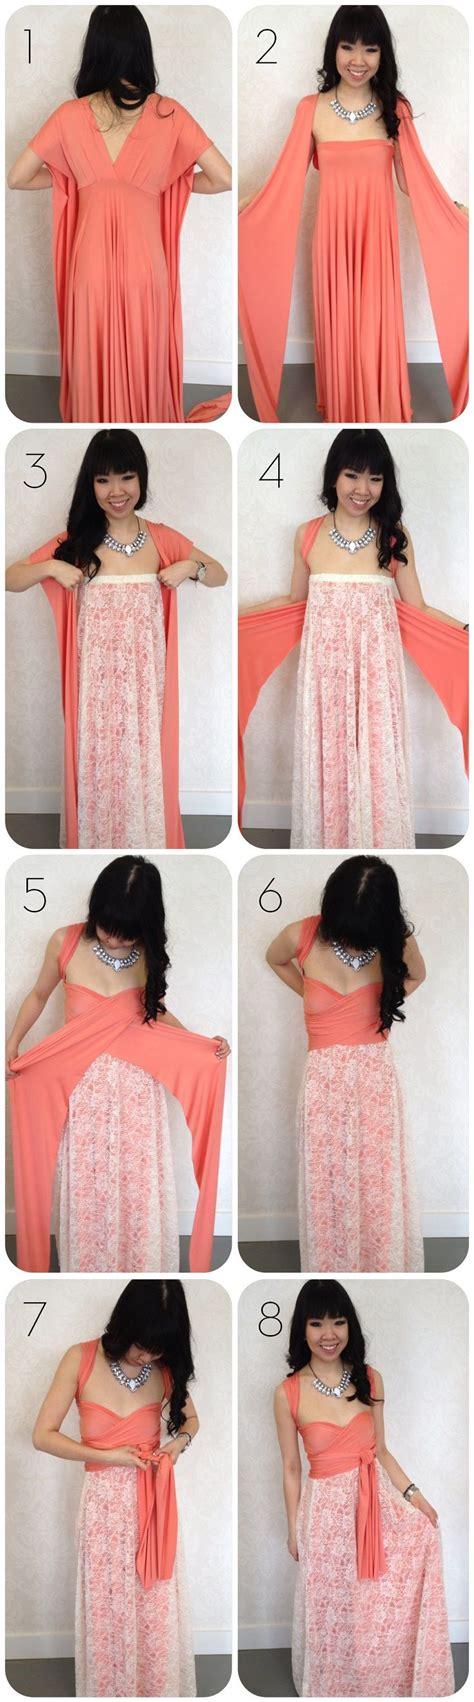 top 10 diy clothing tutorials wrap dresses infinity dress and wraps